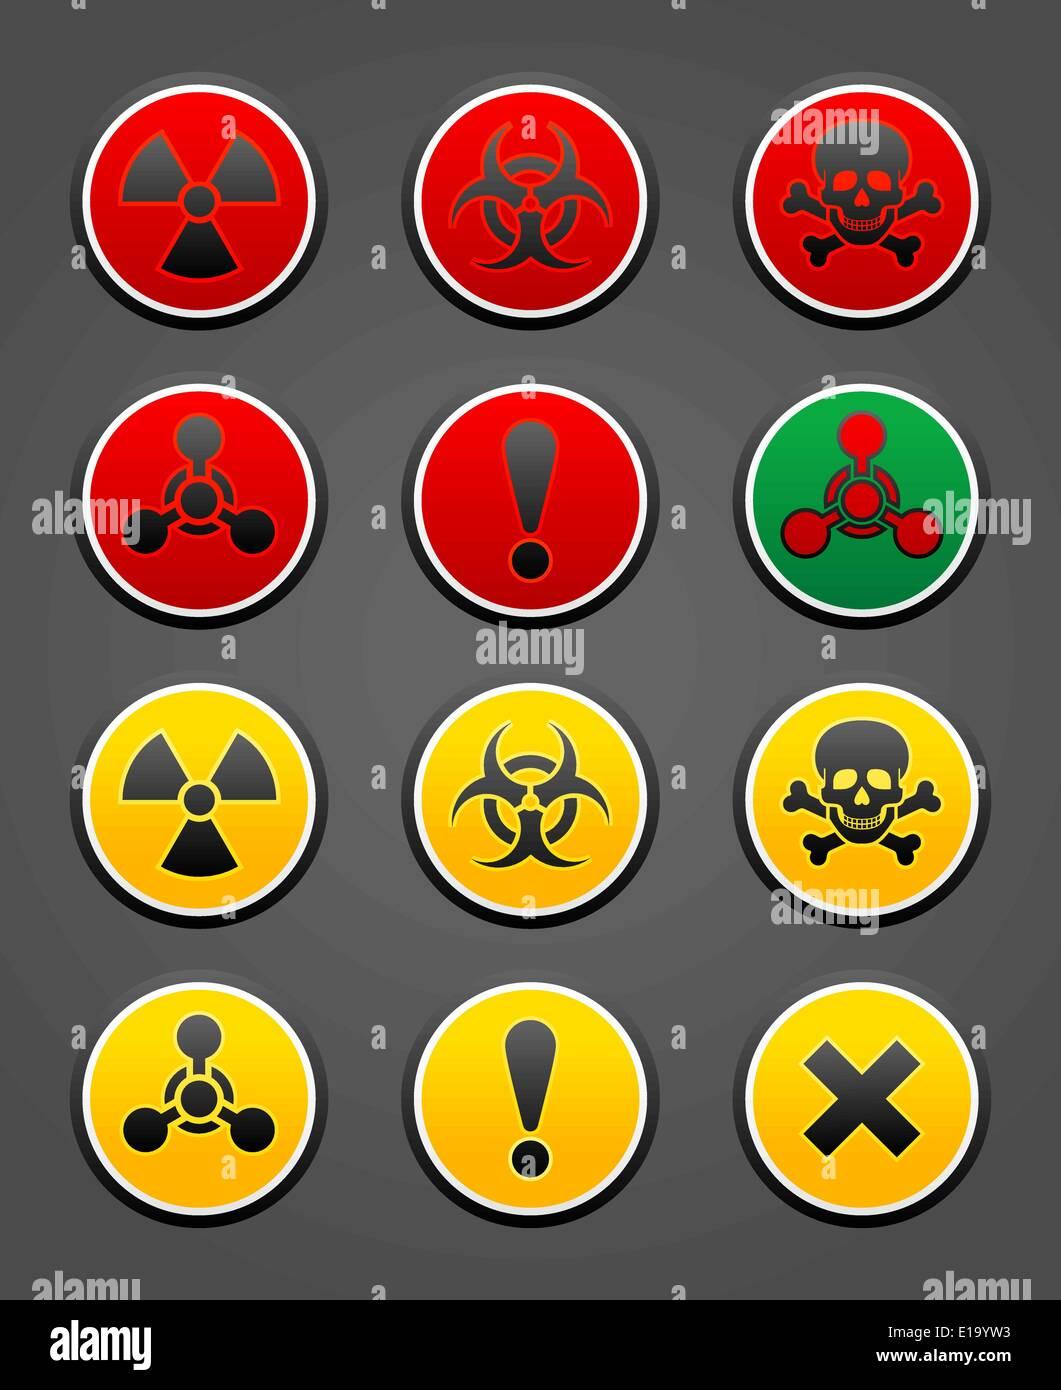 Biological Hazard Symbols Stock Photos Amp Biological Hazard Symbols Stock Images